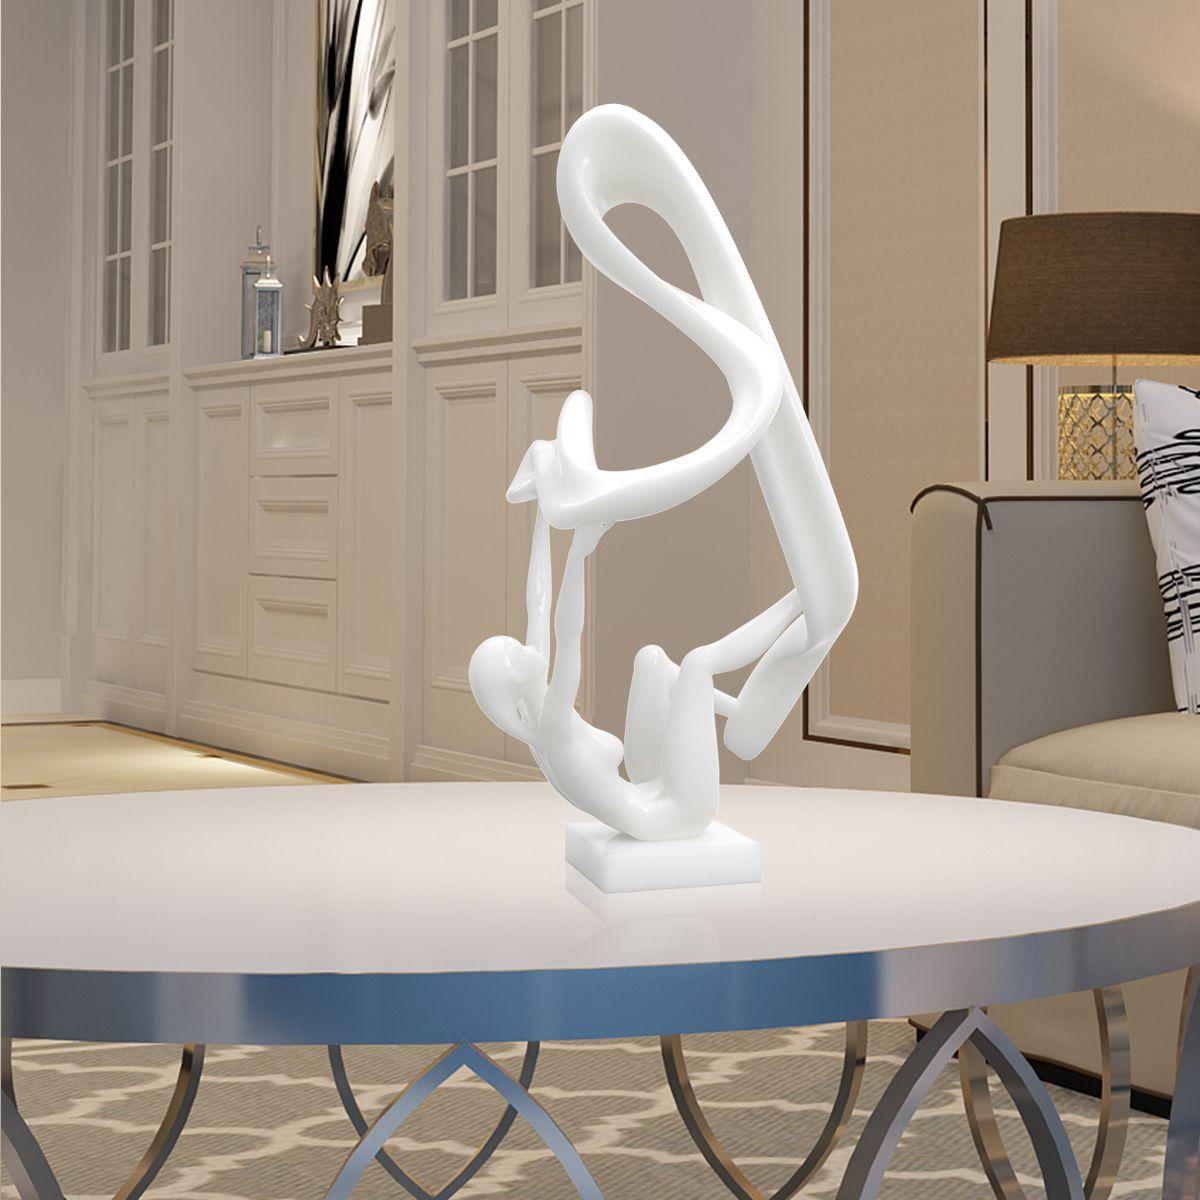 Originally Designed Flutter Design Human Body Woman Figurine Sculpture Resin Modern Home Decor Furnishing Ornaments In Statues Sculptures